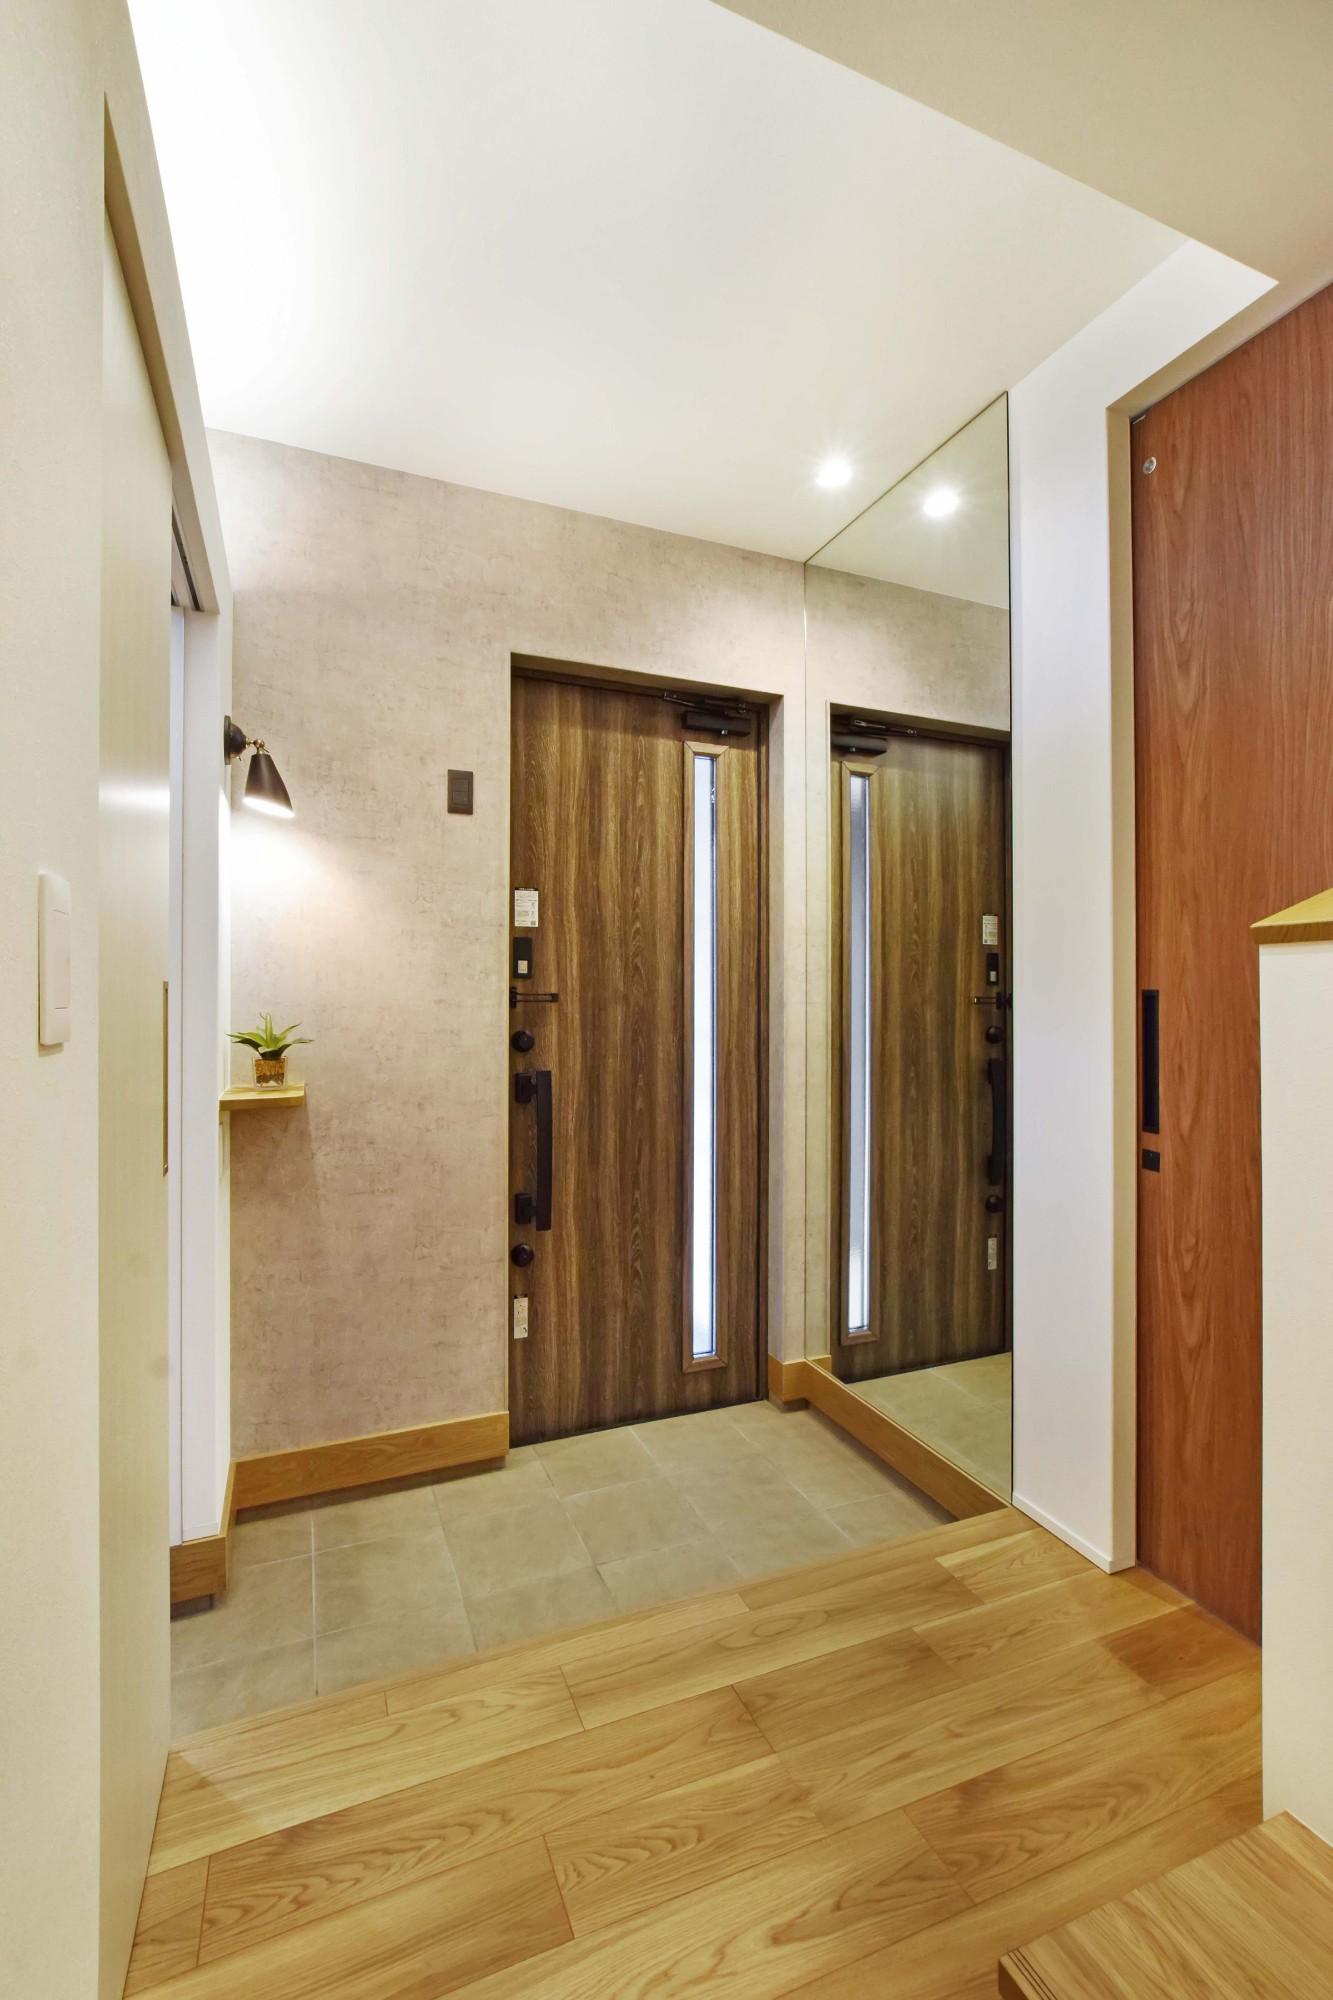 DETAIL HOME(ディテールホーム)「和と洋の溶け合う心地いい暮らし」の和風・和モダンな玄関の実例写真